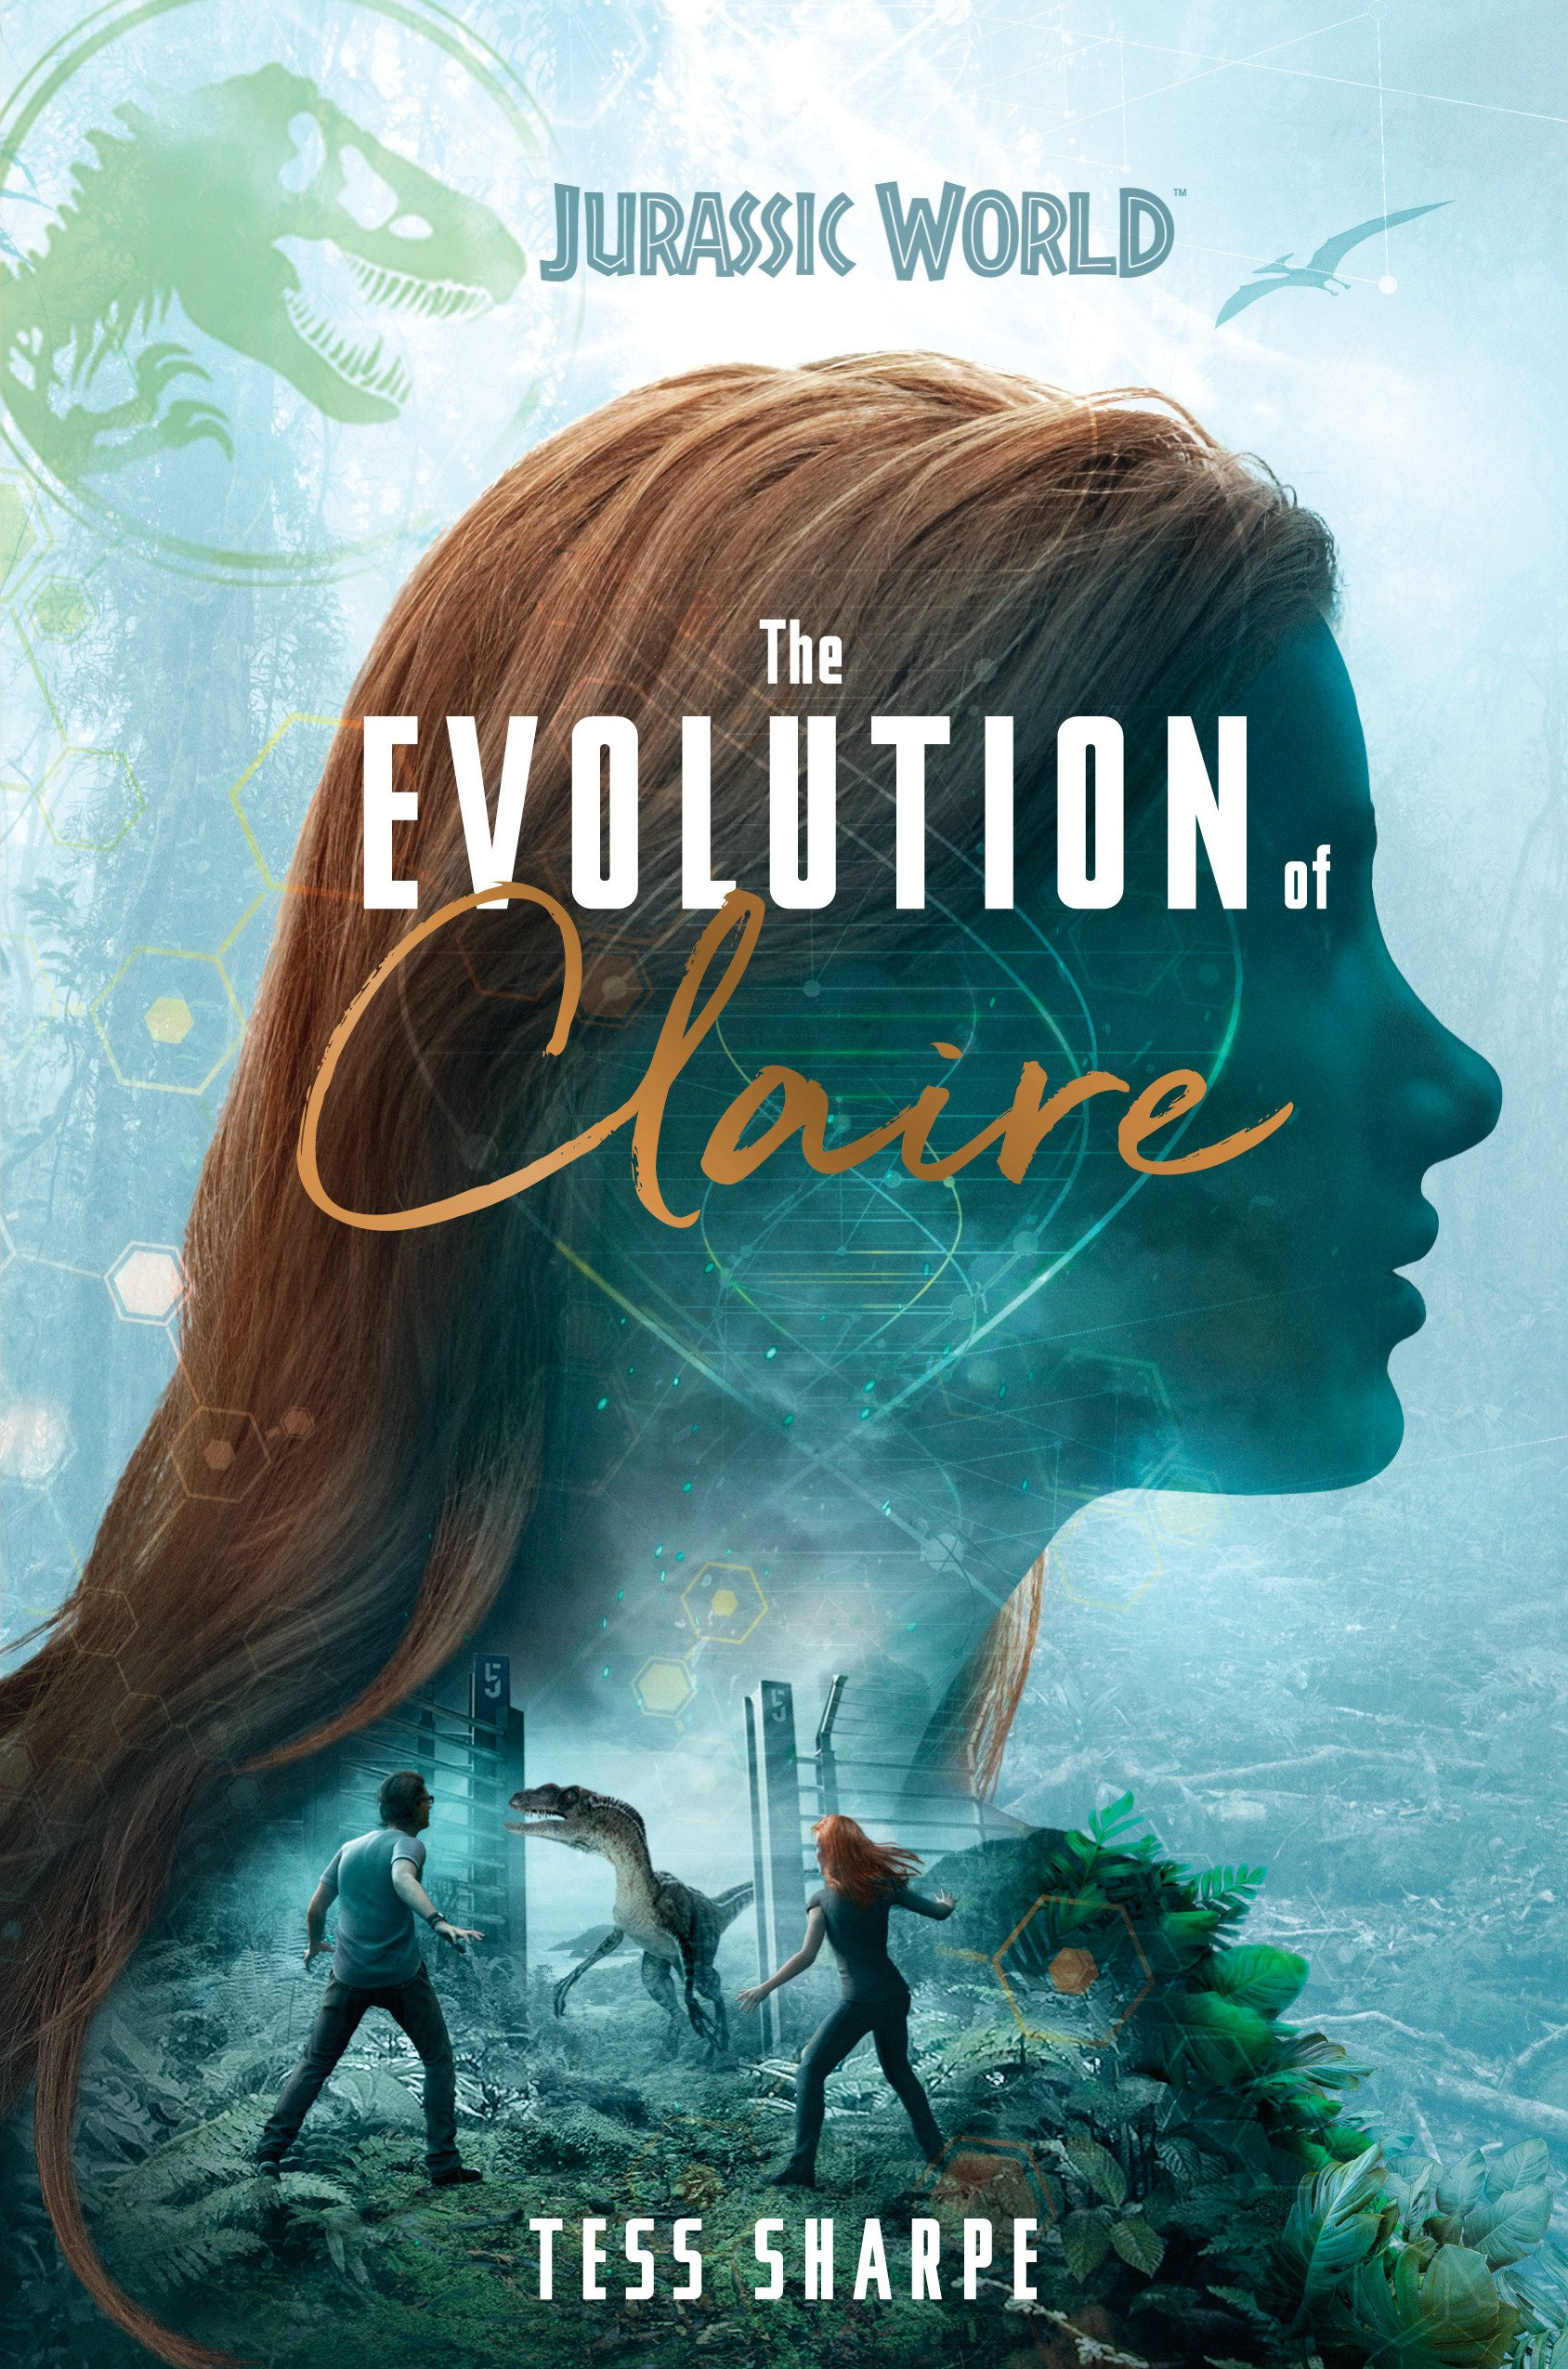 Jurassic World the Evolution of Claire book Dinosaur